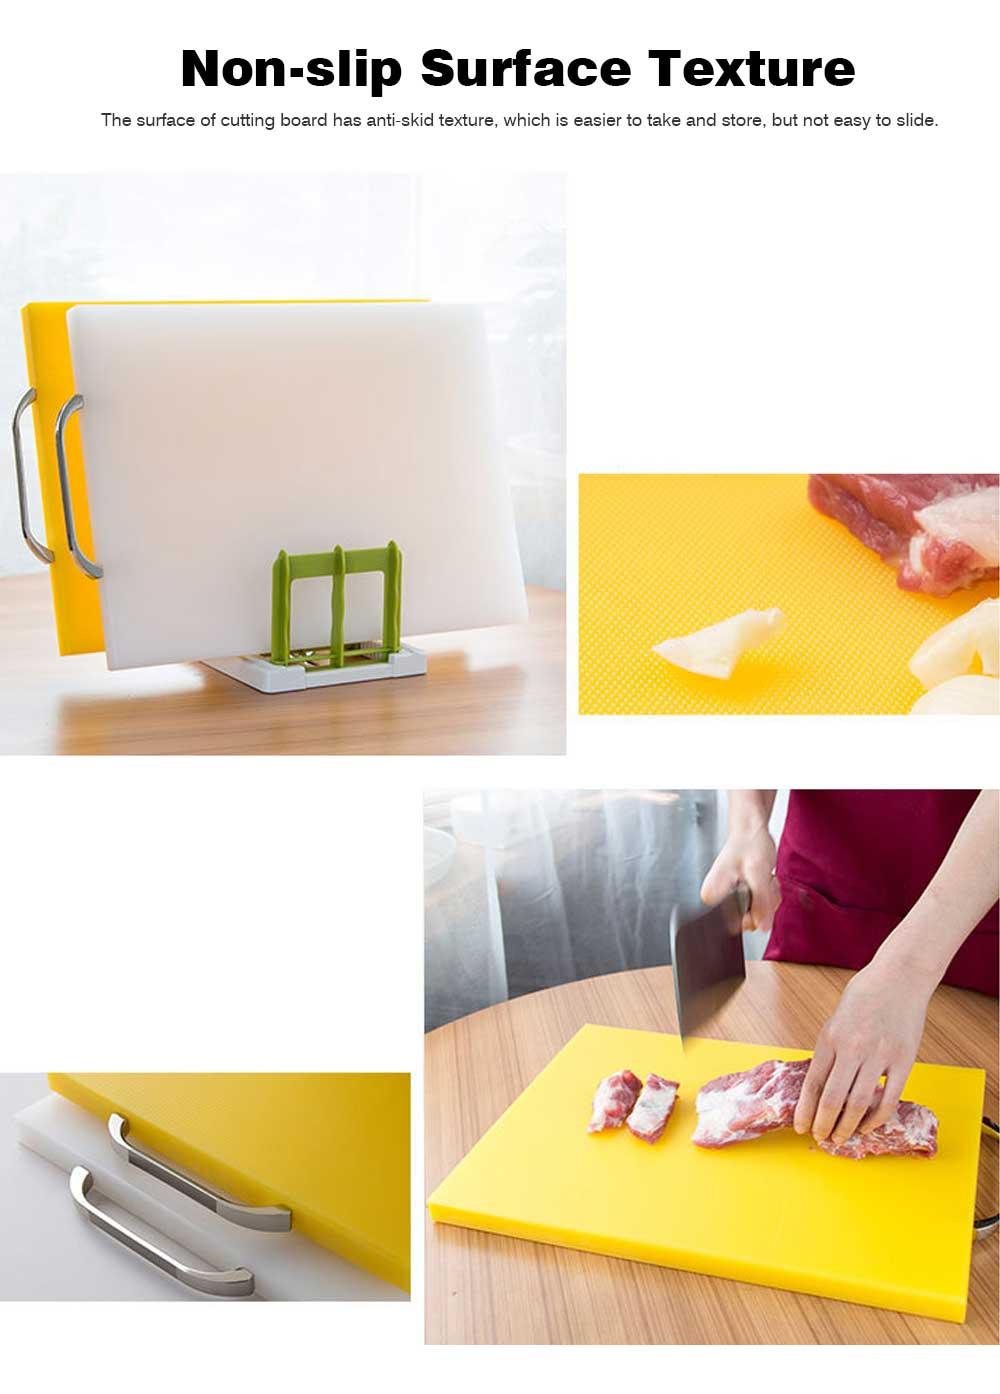 Anti-slip Multi-function Cutting Board, High-quality PE Cutting Board for Cutting Cooked Food, Vegetables, Fruits 5